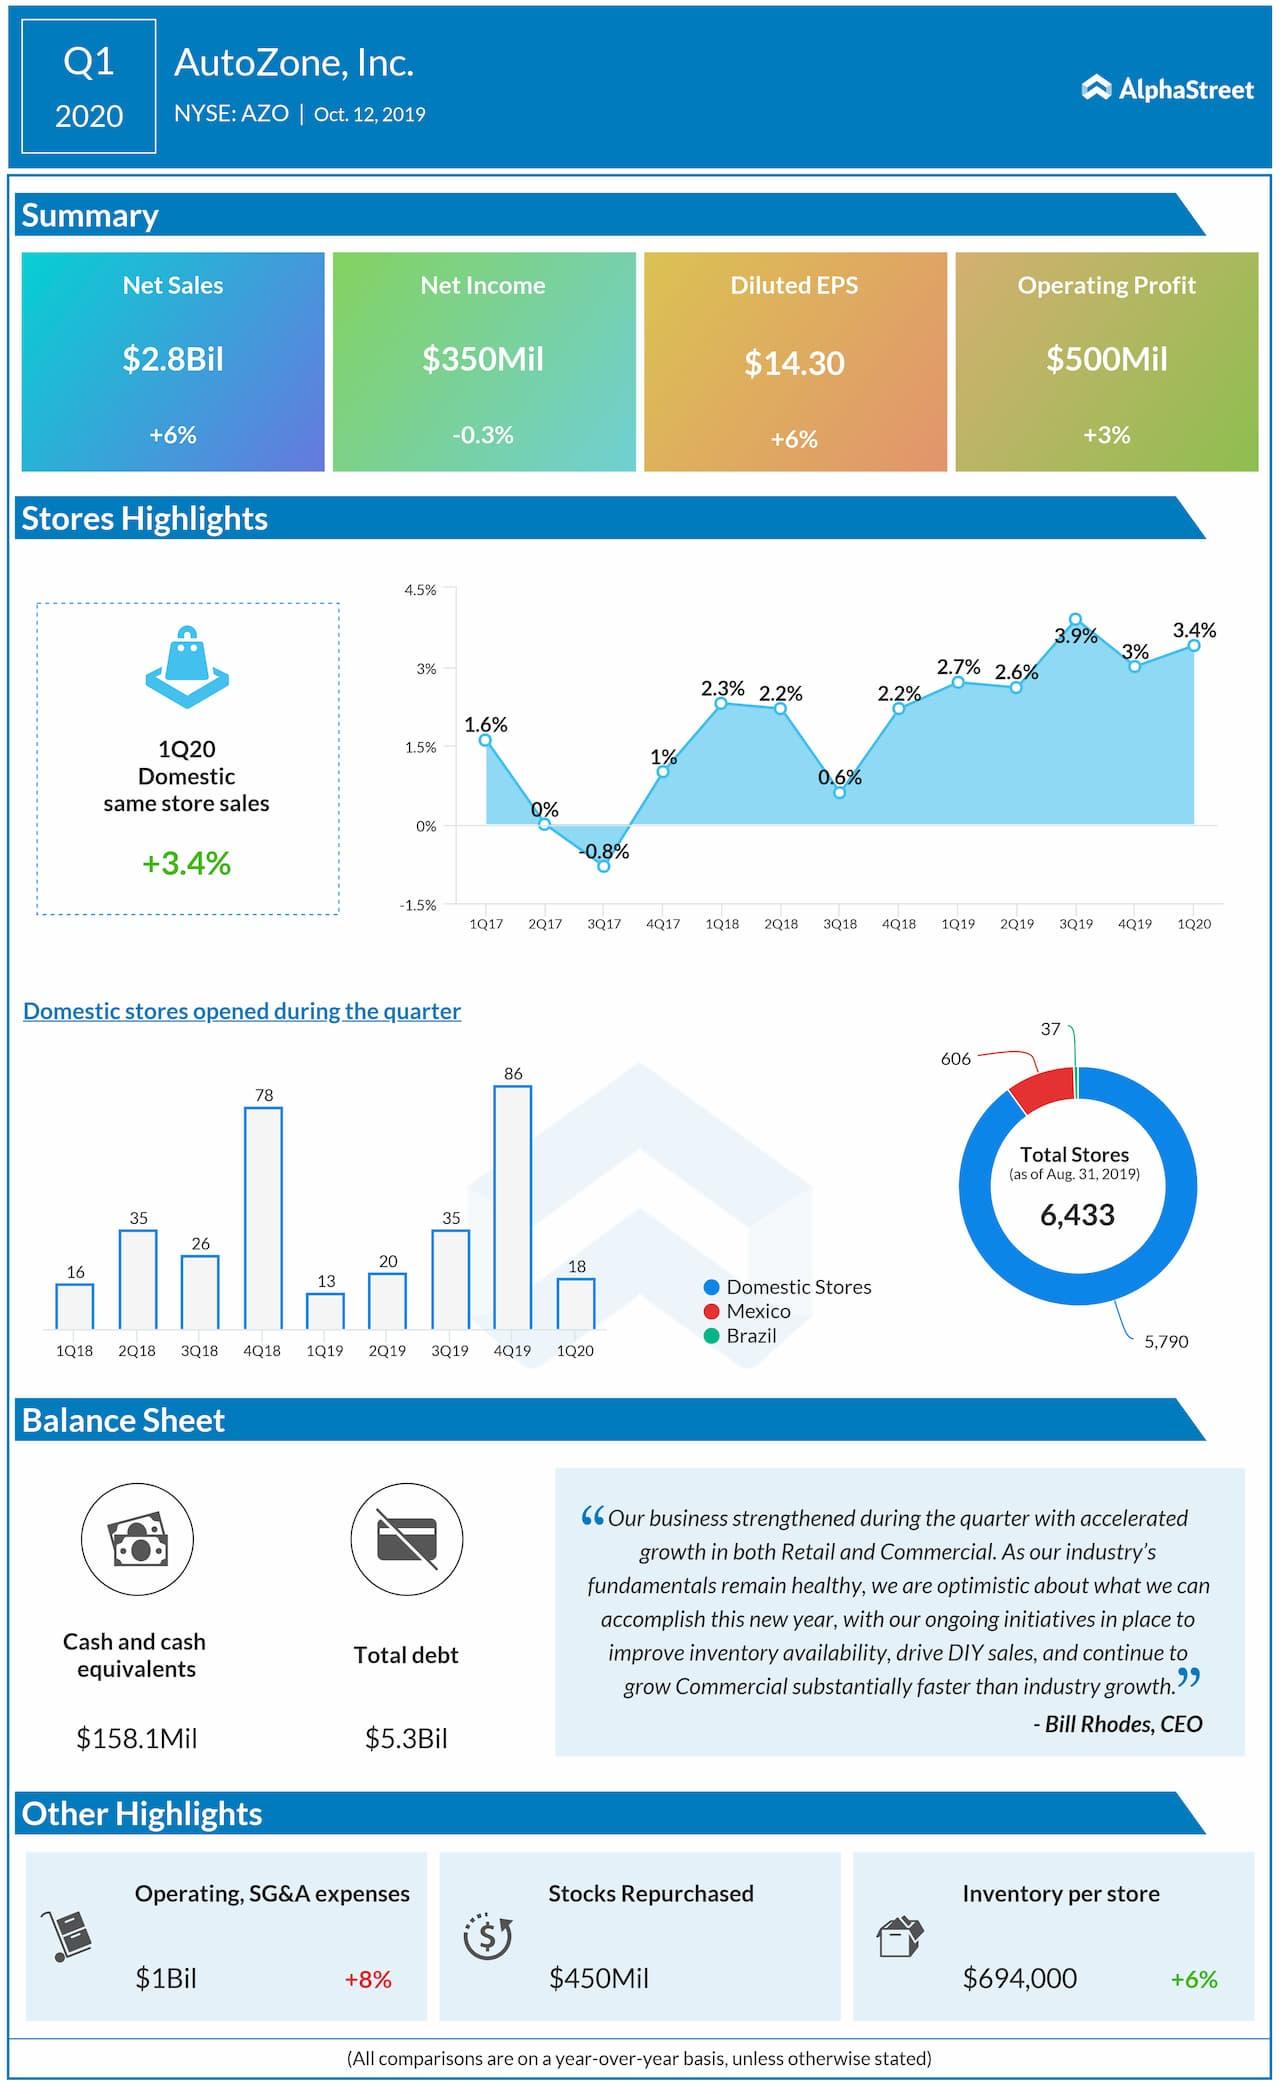 AutoZone (AZO) Q1 2020 Earnings Review